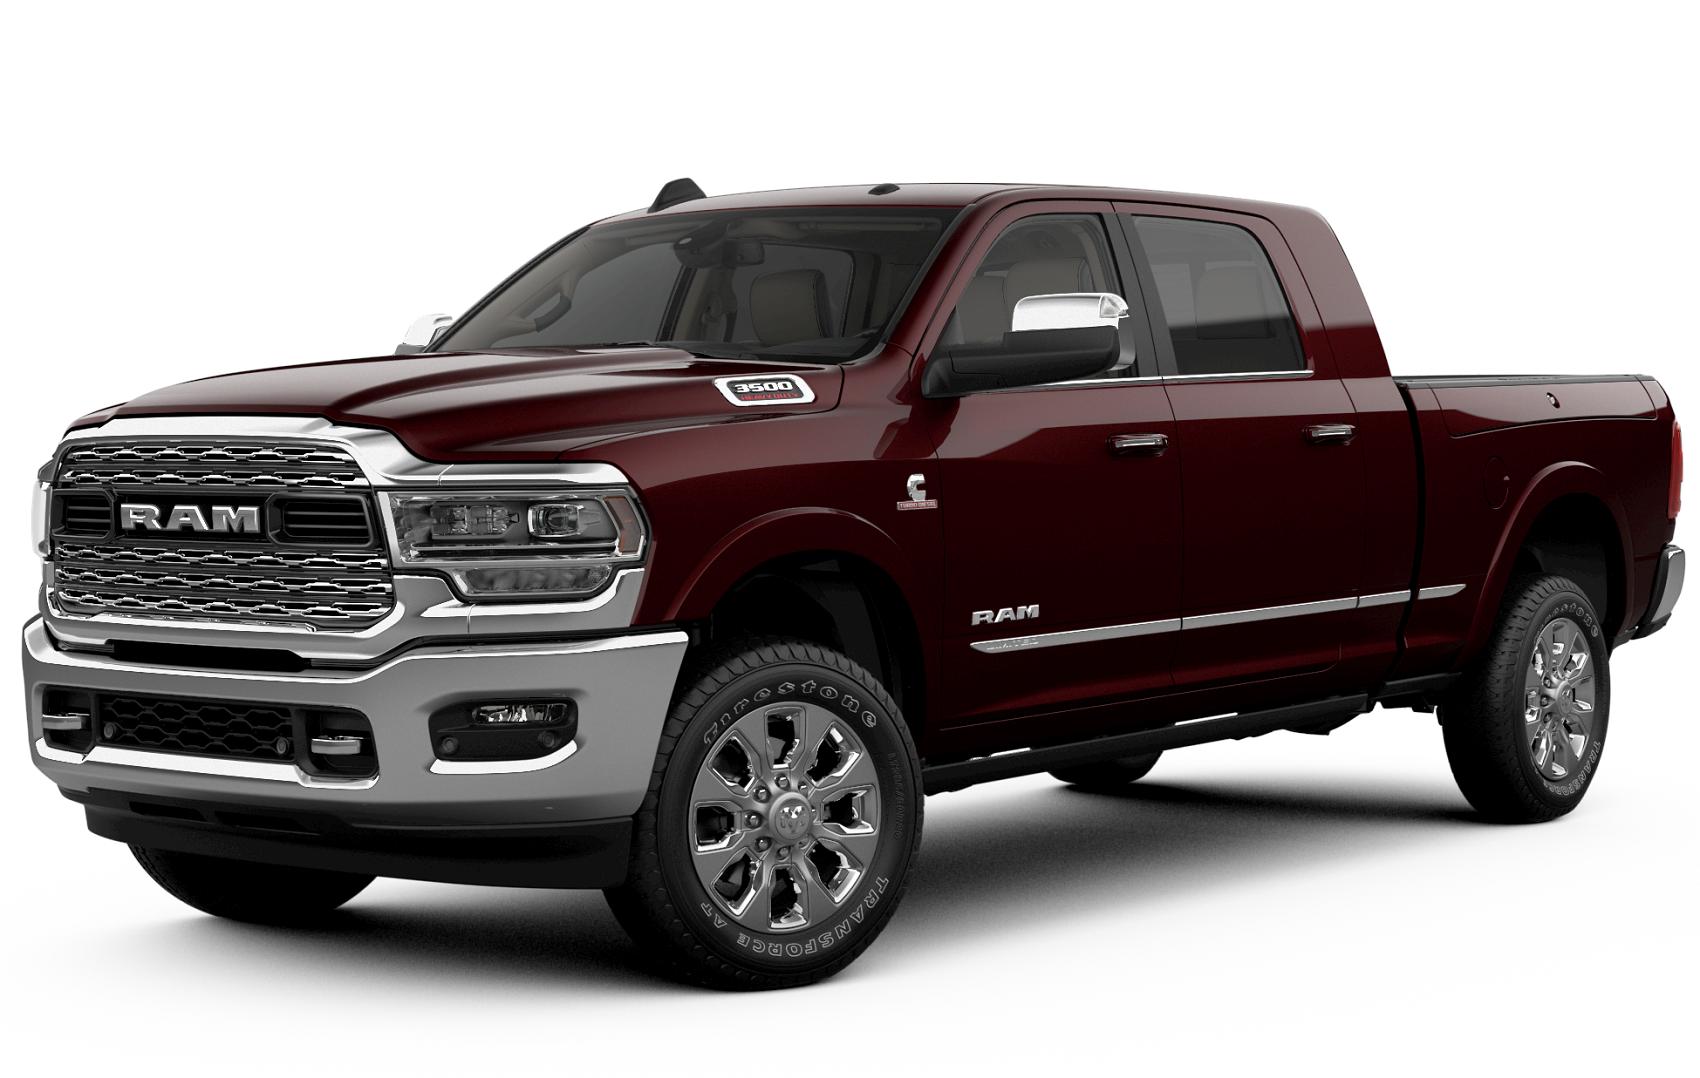 Ram Trucks Medford MA